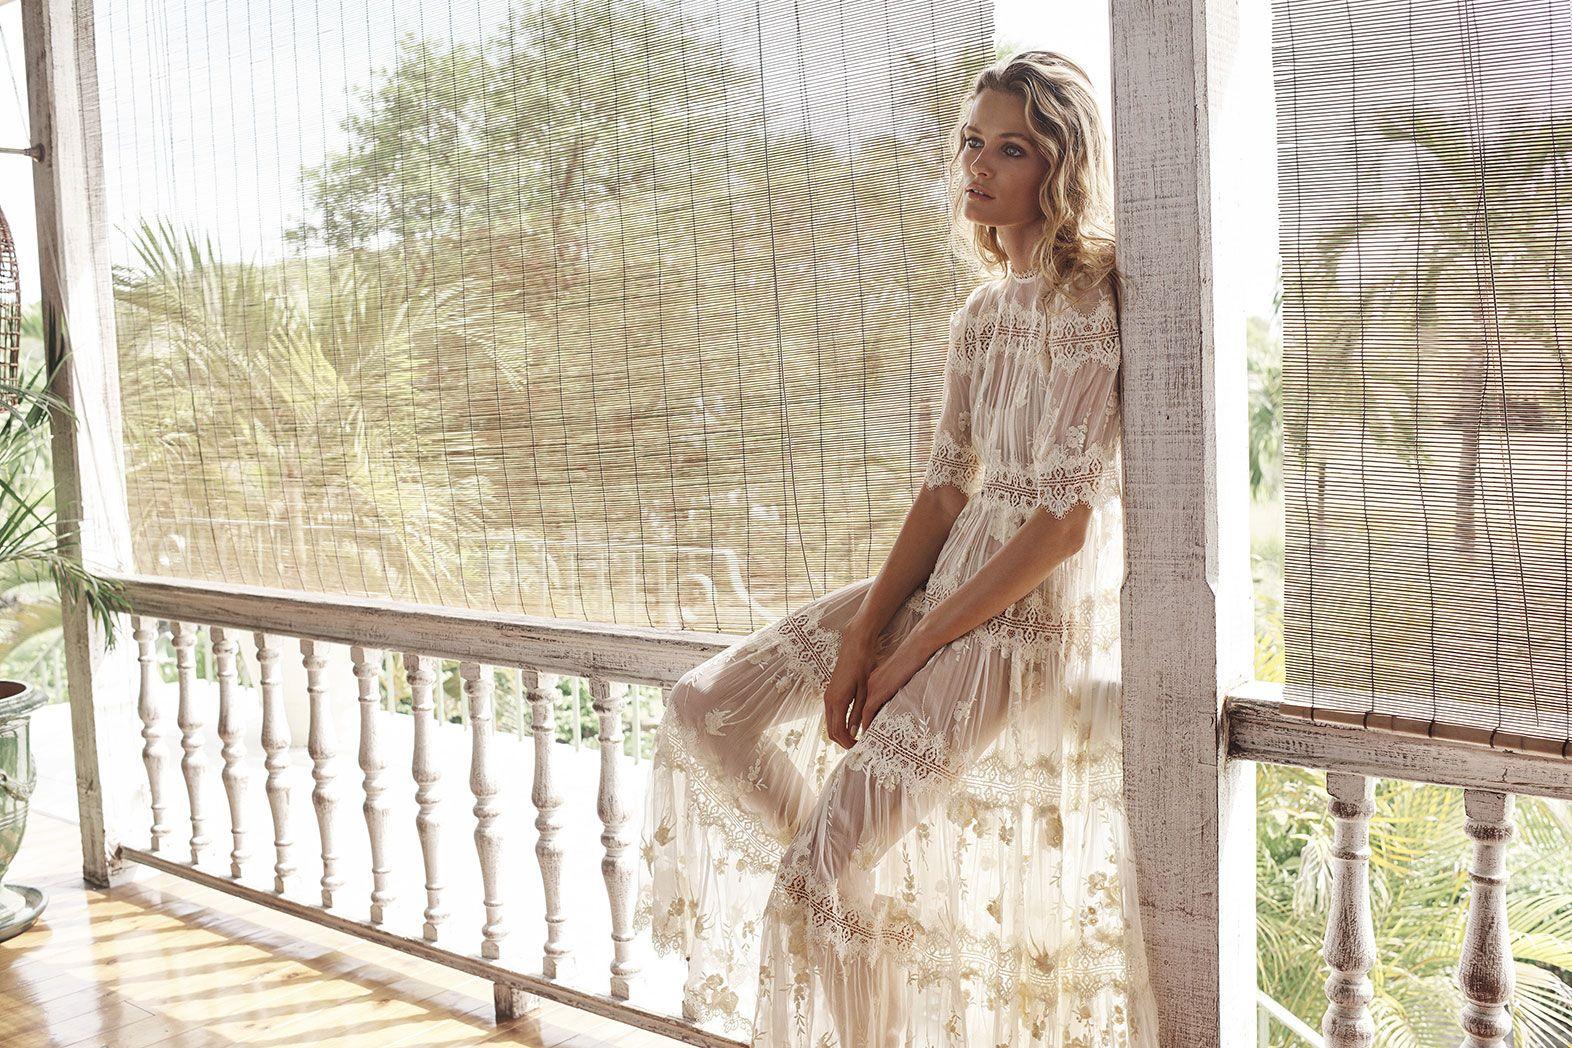 White ruffle apron australia - Tropicale Antique Dress Zimmermann Dress Designer Clothing Summer Wardrobe Australia Swim And Resort